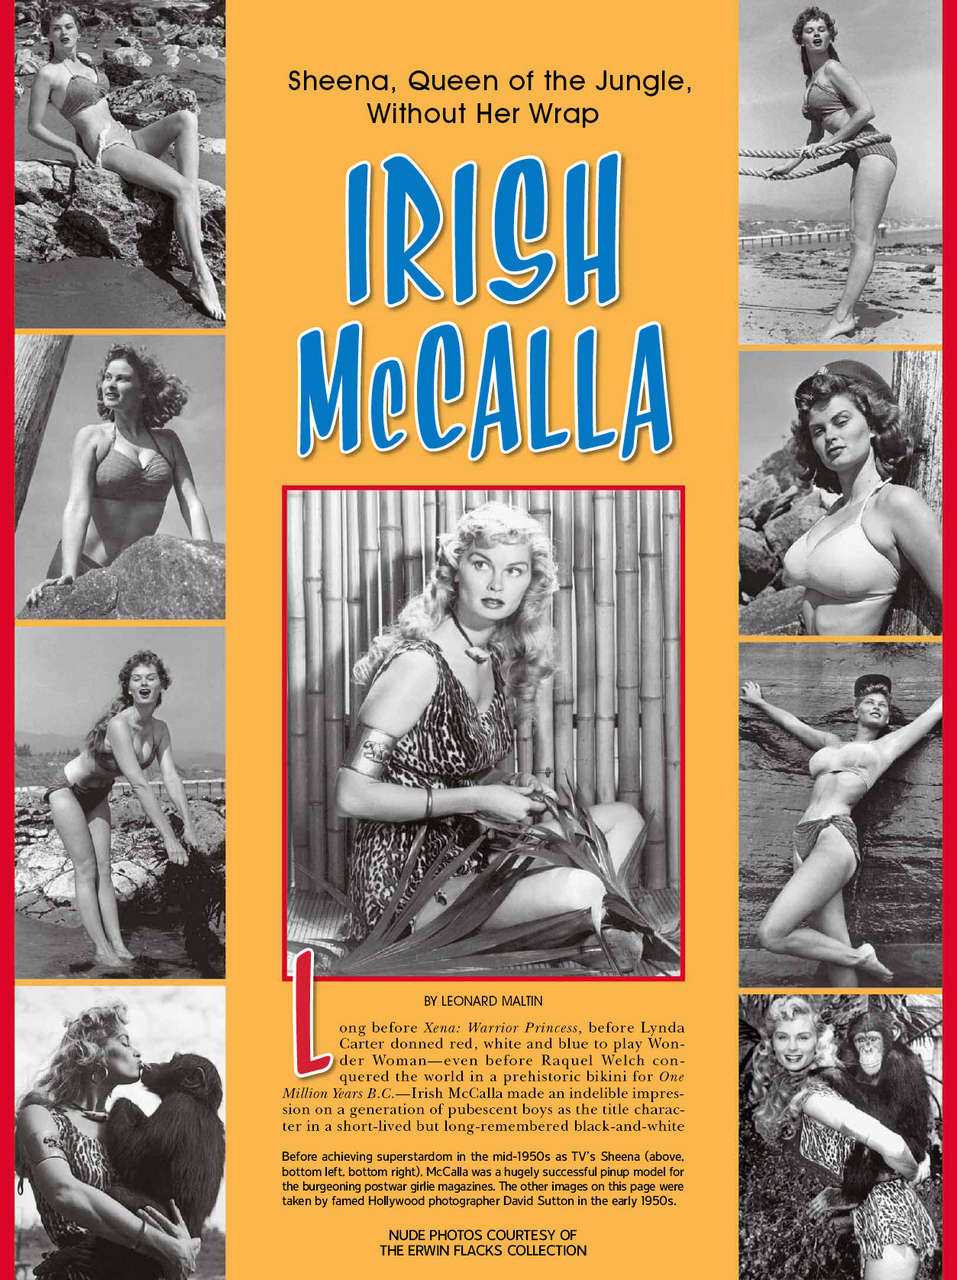 Irish Mccalla NSFW